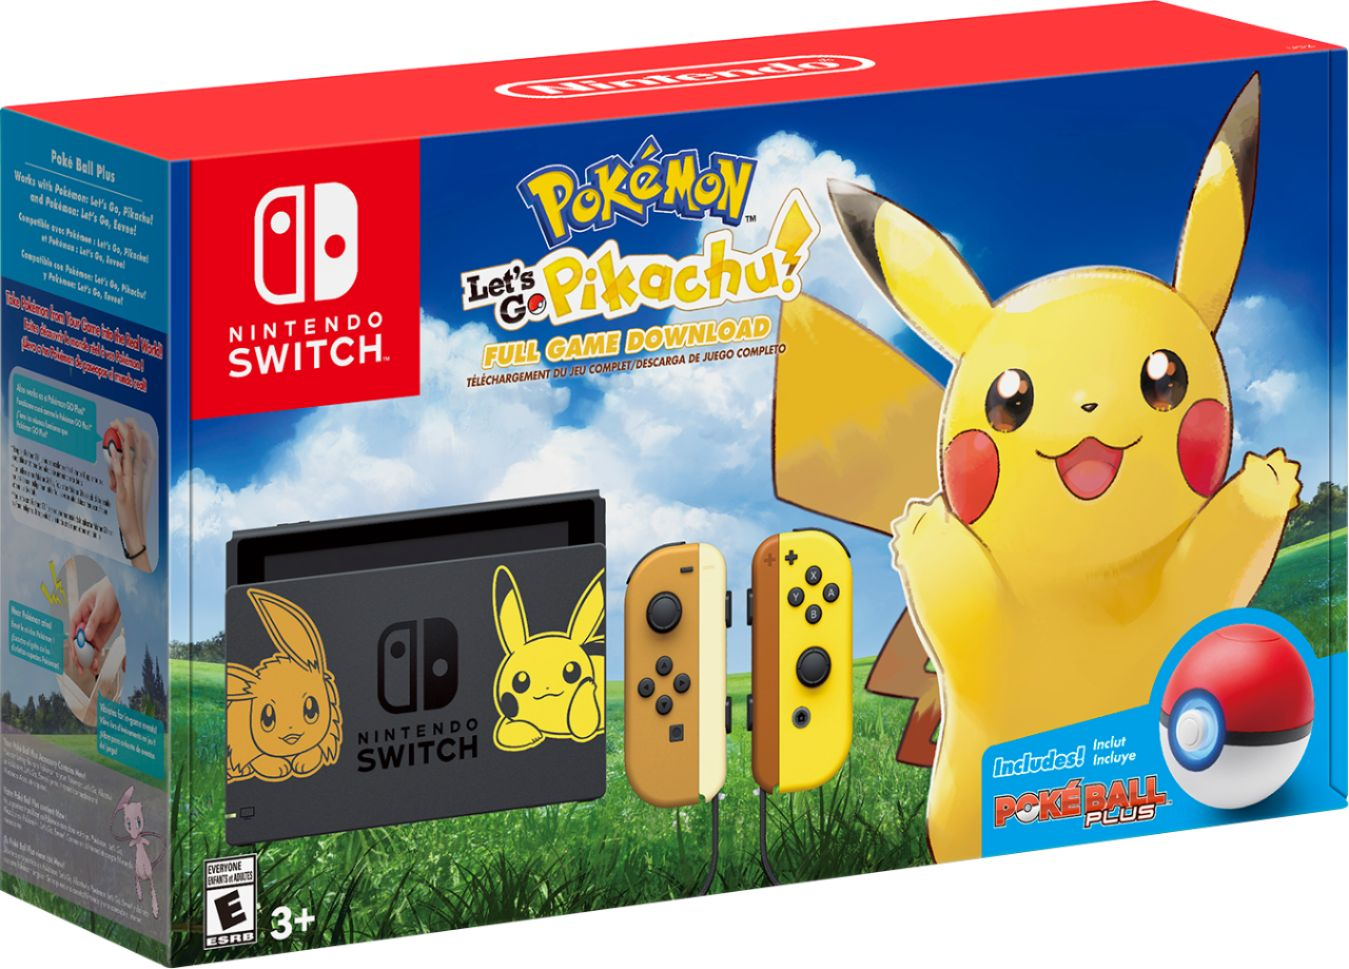 Best Buy: Nintendo Switch Pikachu & Eevee Edition with Pokémon: Let's Go, Pikachu! + Poké Ball Plus Gray HACSKFALF